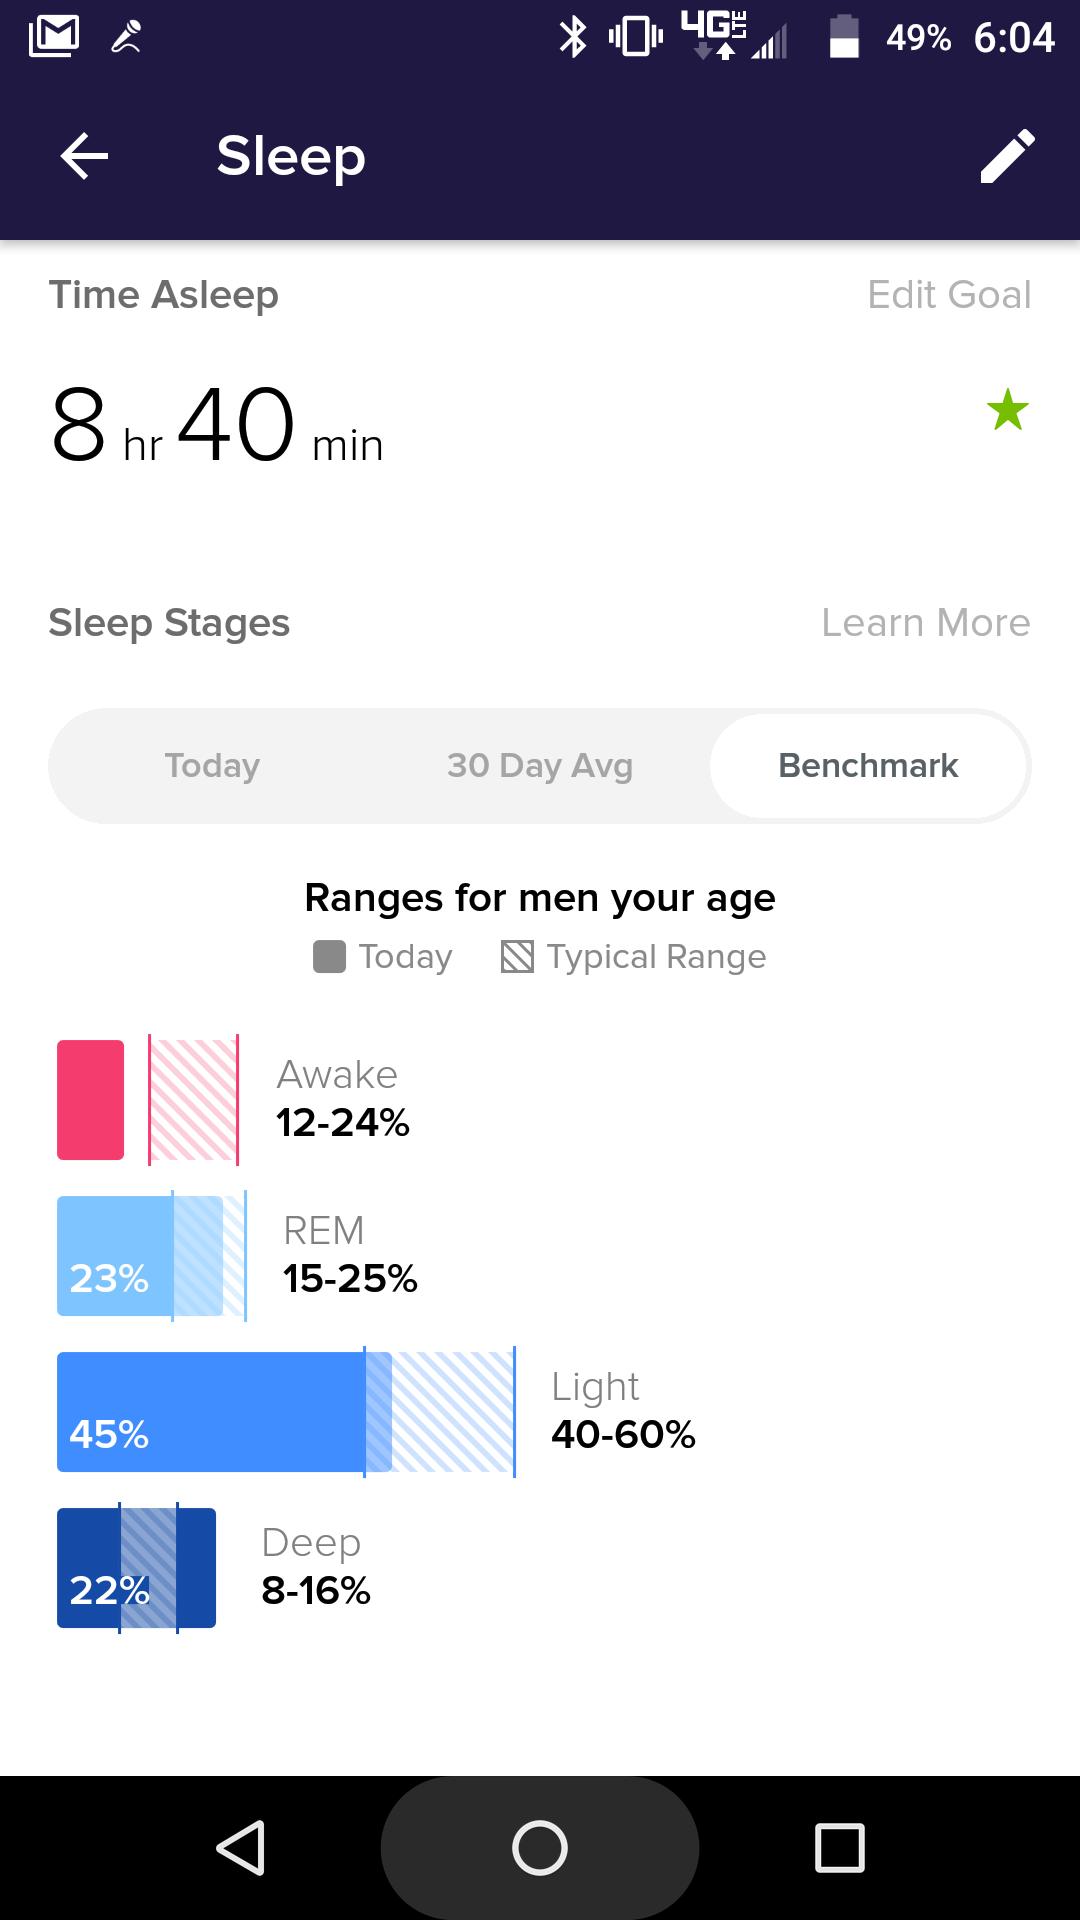 fitbit s new sleep tracker is pretty darn cool